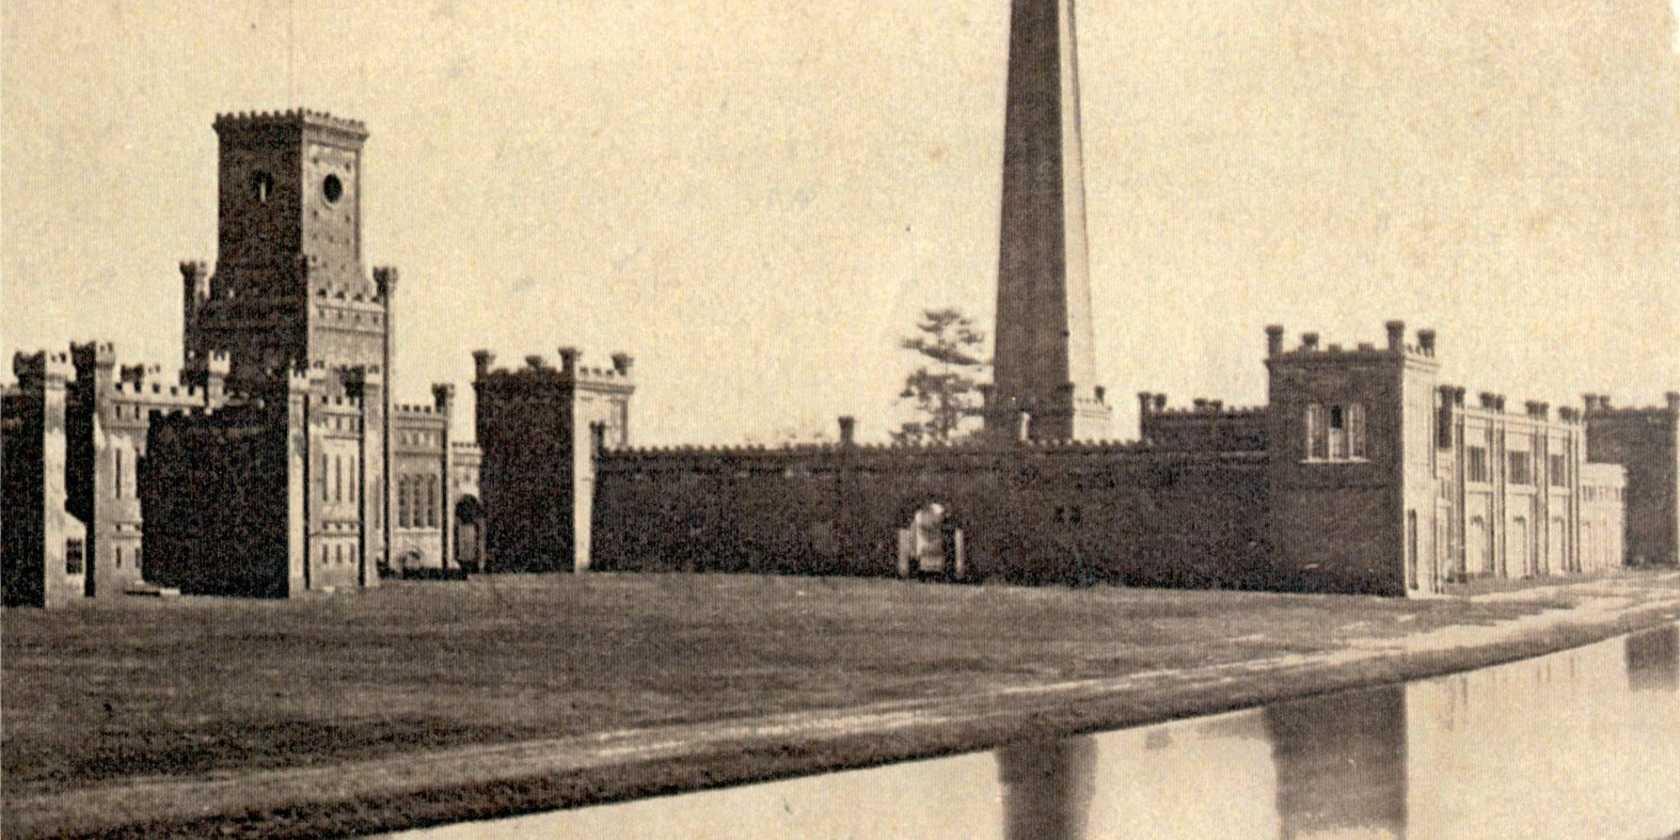 Civil War History in Augusta | Historic Landmarks & Sites